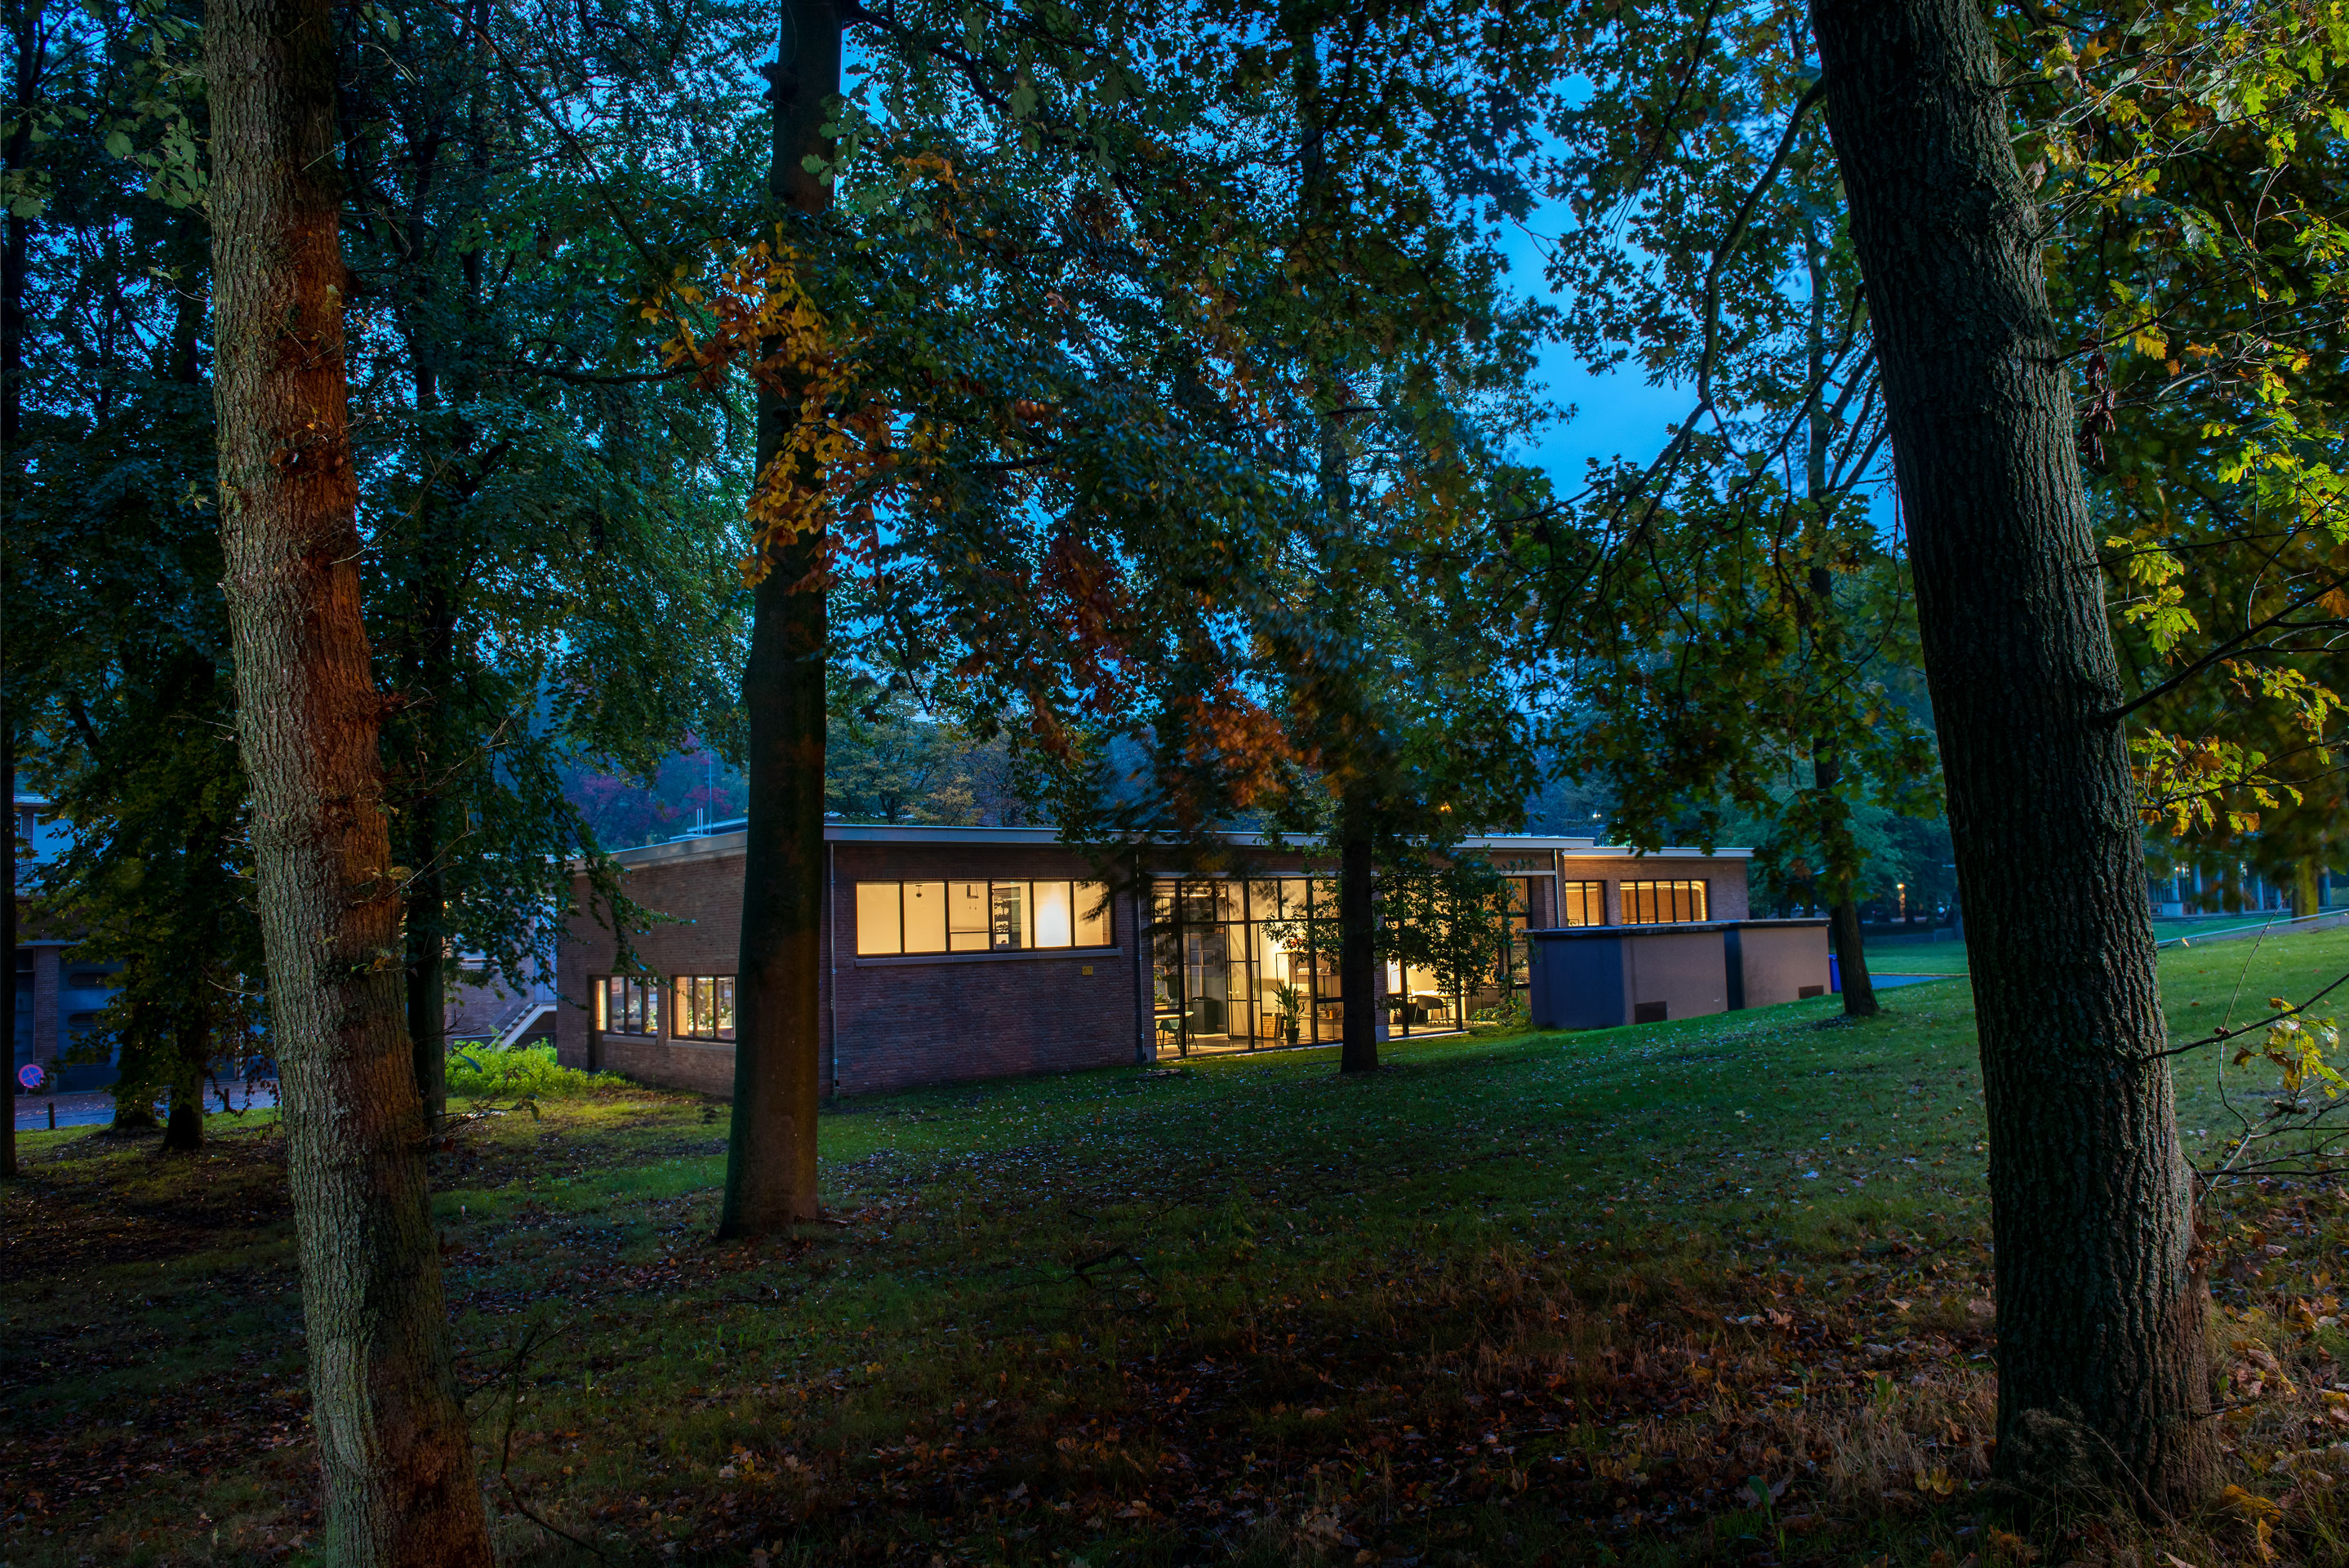 Arnhems-Buiten_B09_Weusten-Liedenbaum-Architecten_kantoor